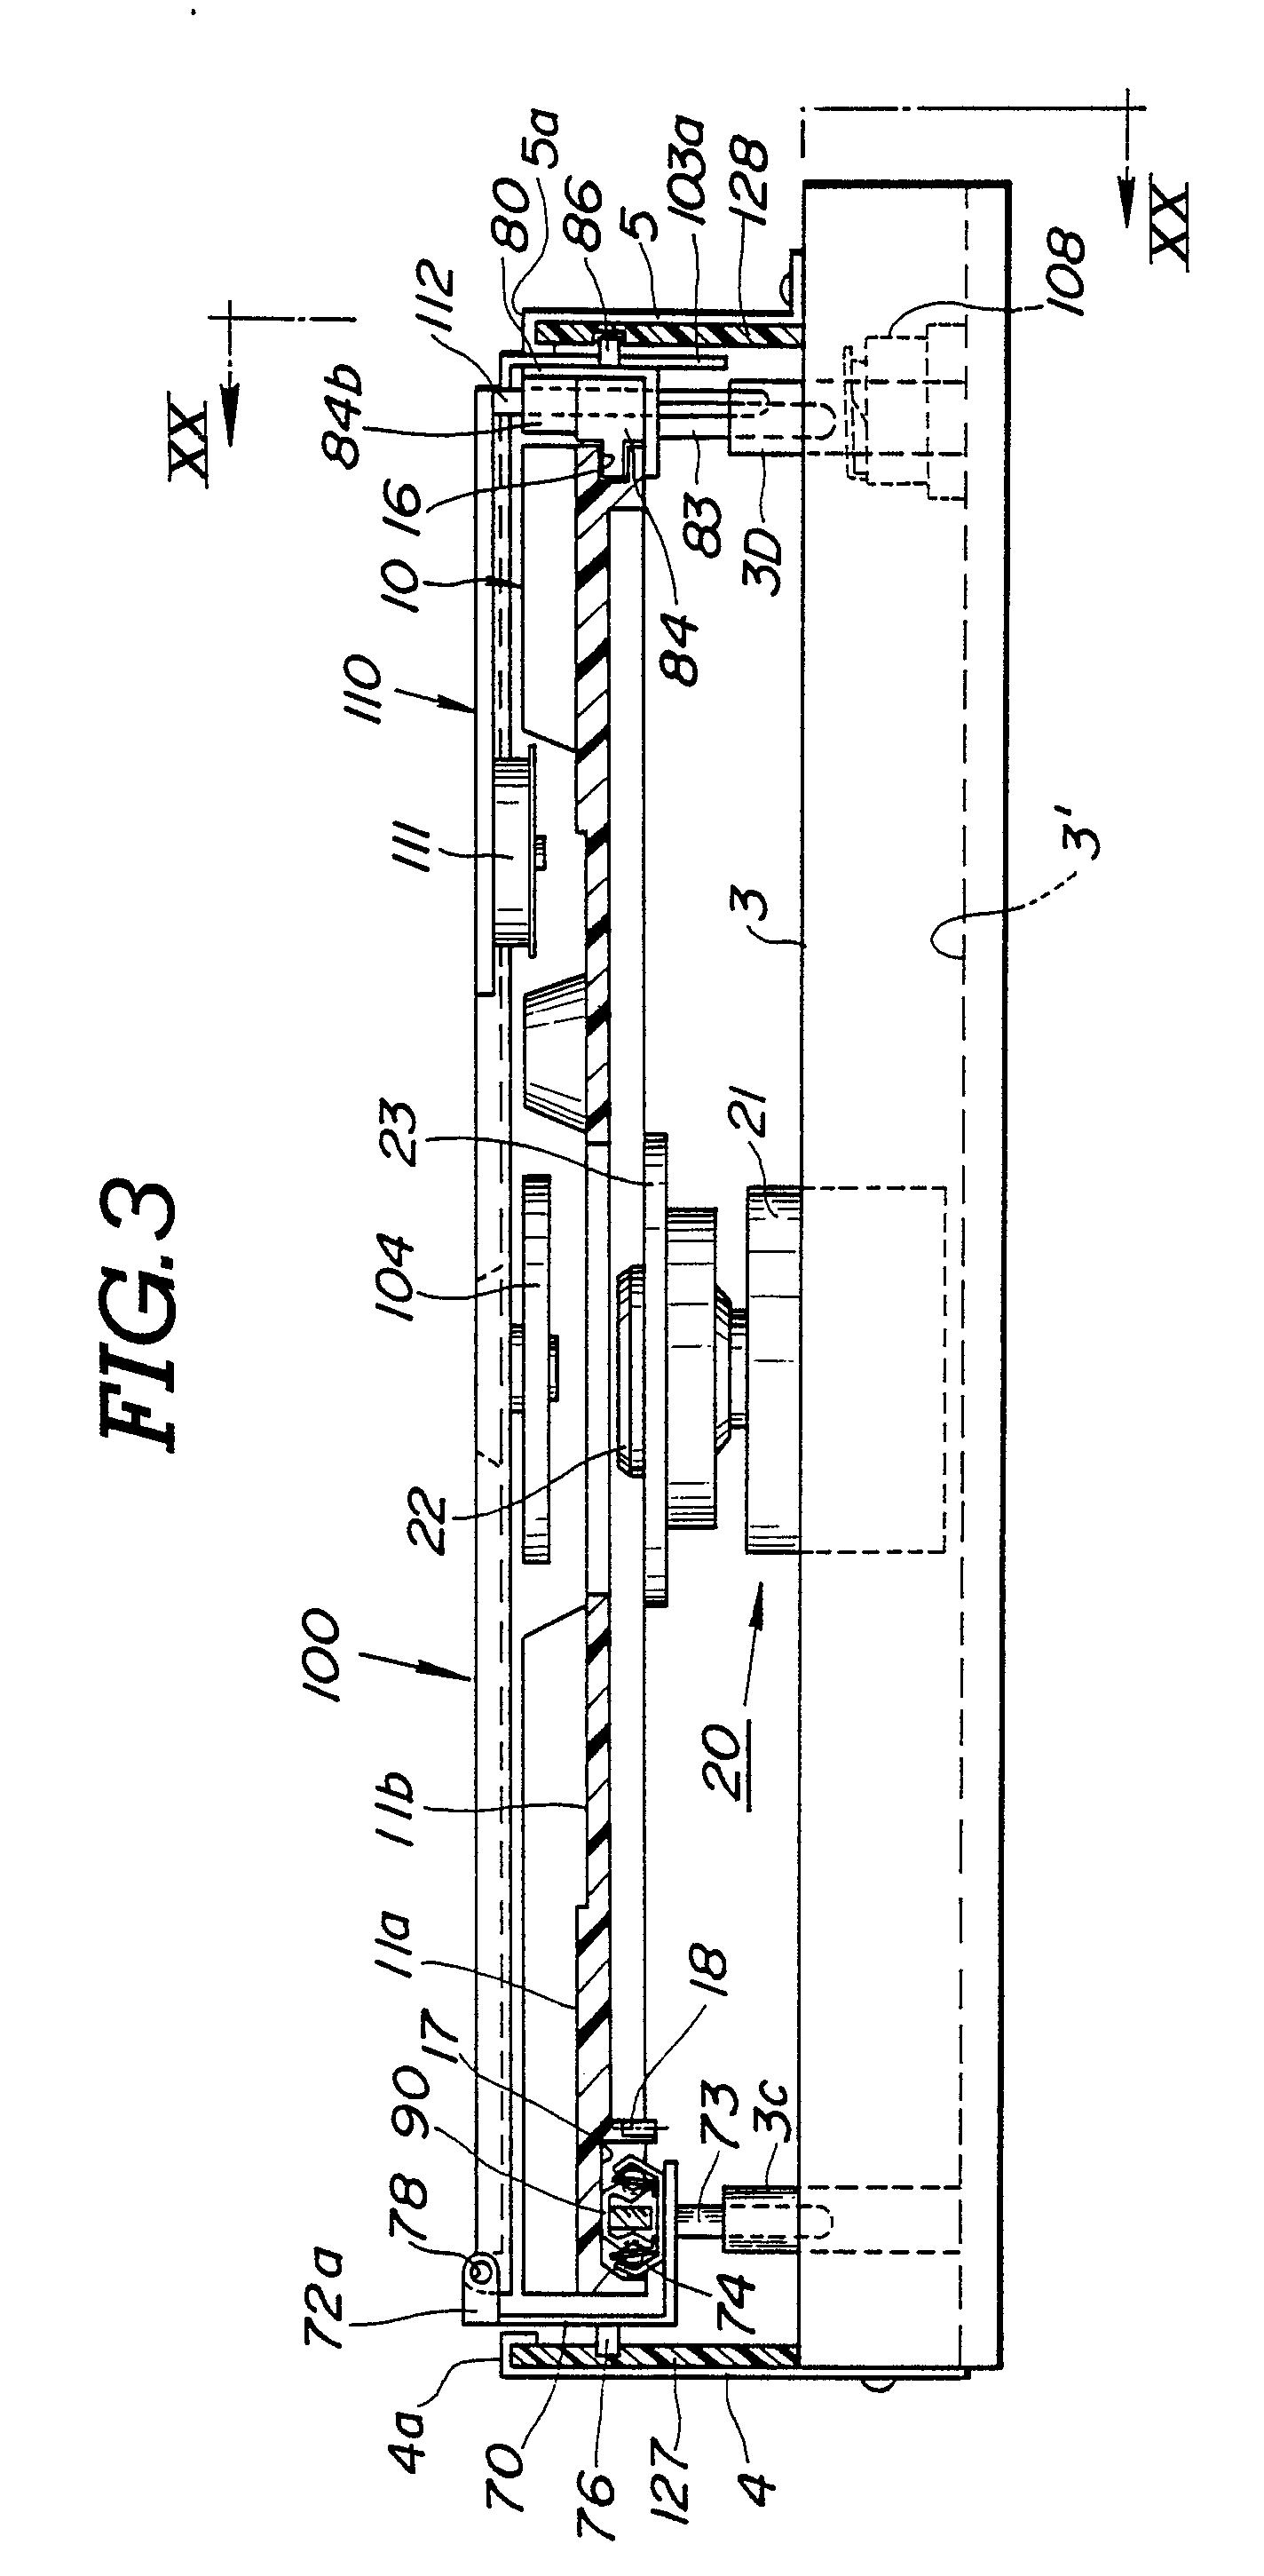 专利ep0261384a1 - apparatus